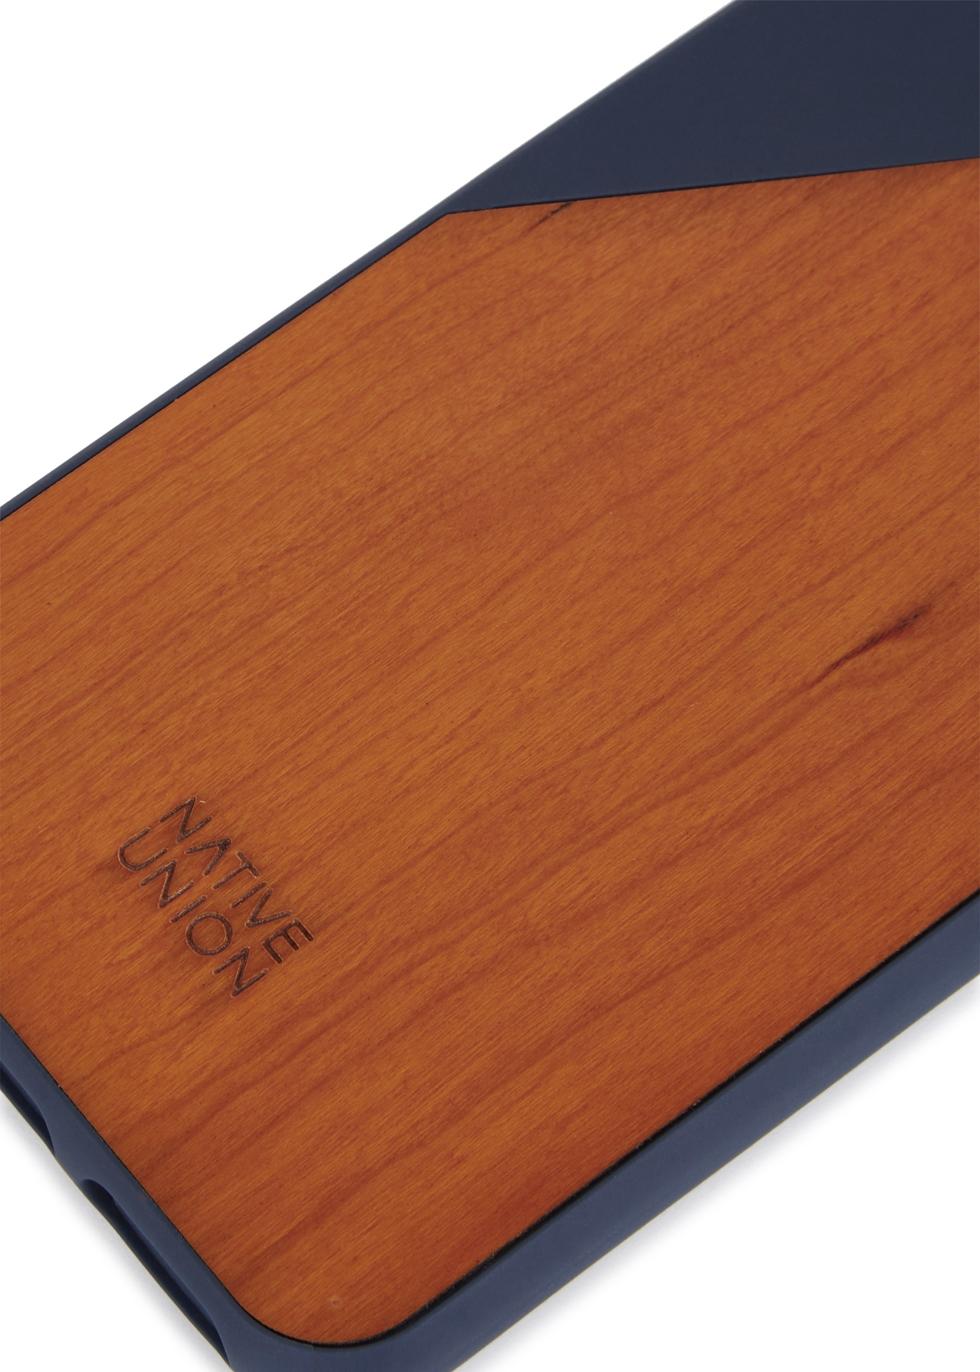 CLIC Wooden iPhone 7 Plus case - Native Union